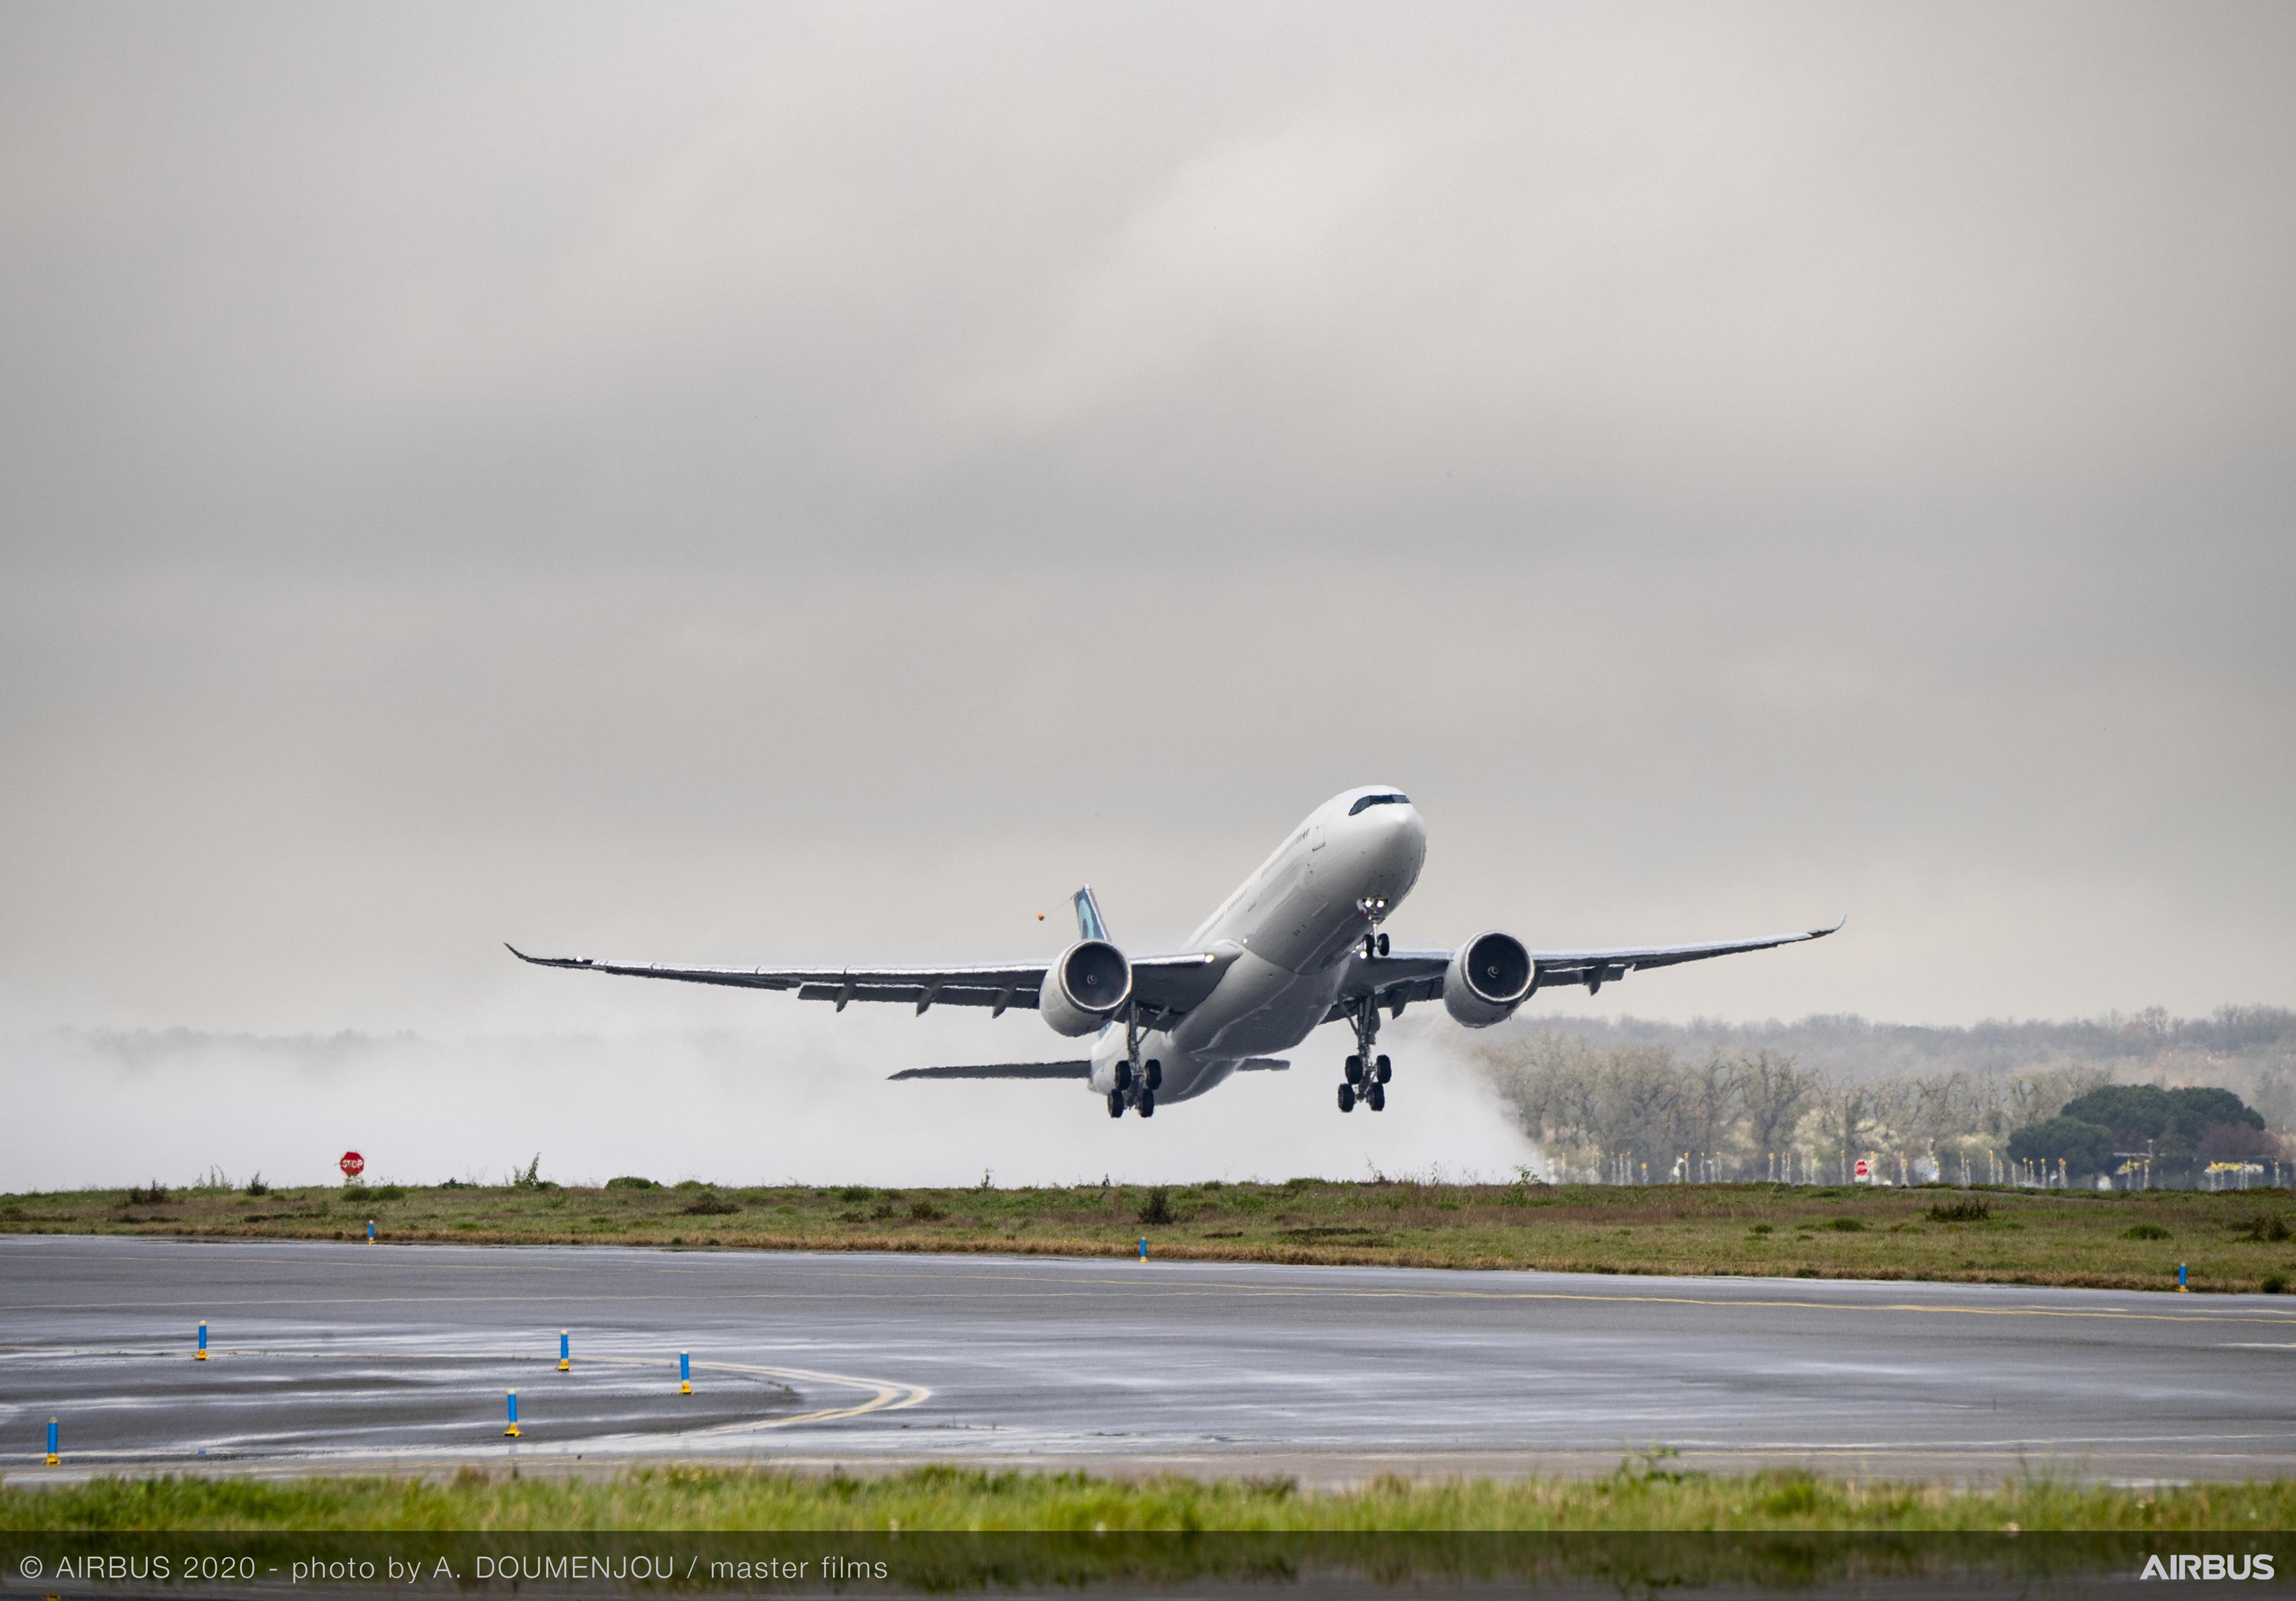 A330-900-Airbus-MSN1967-251-tonnes-first-flight-002